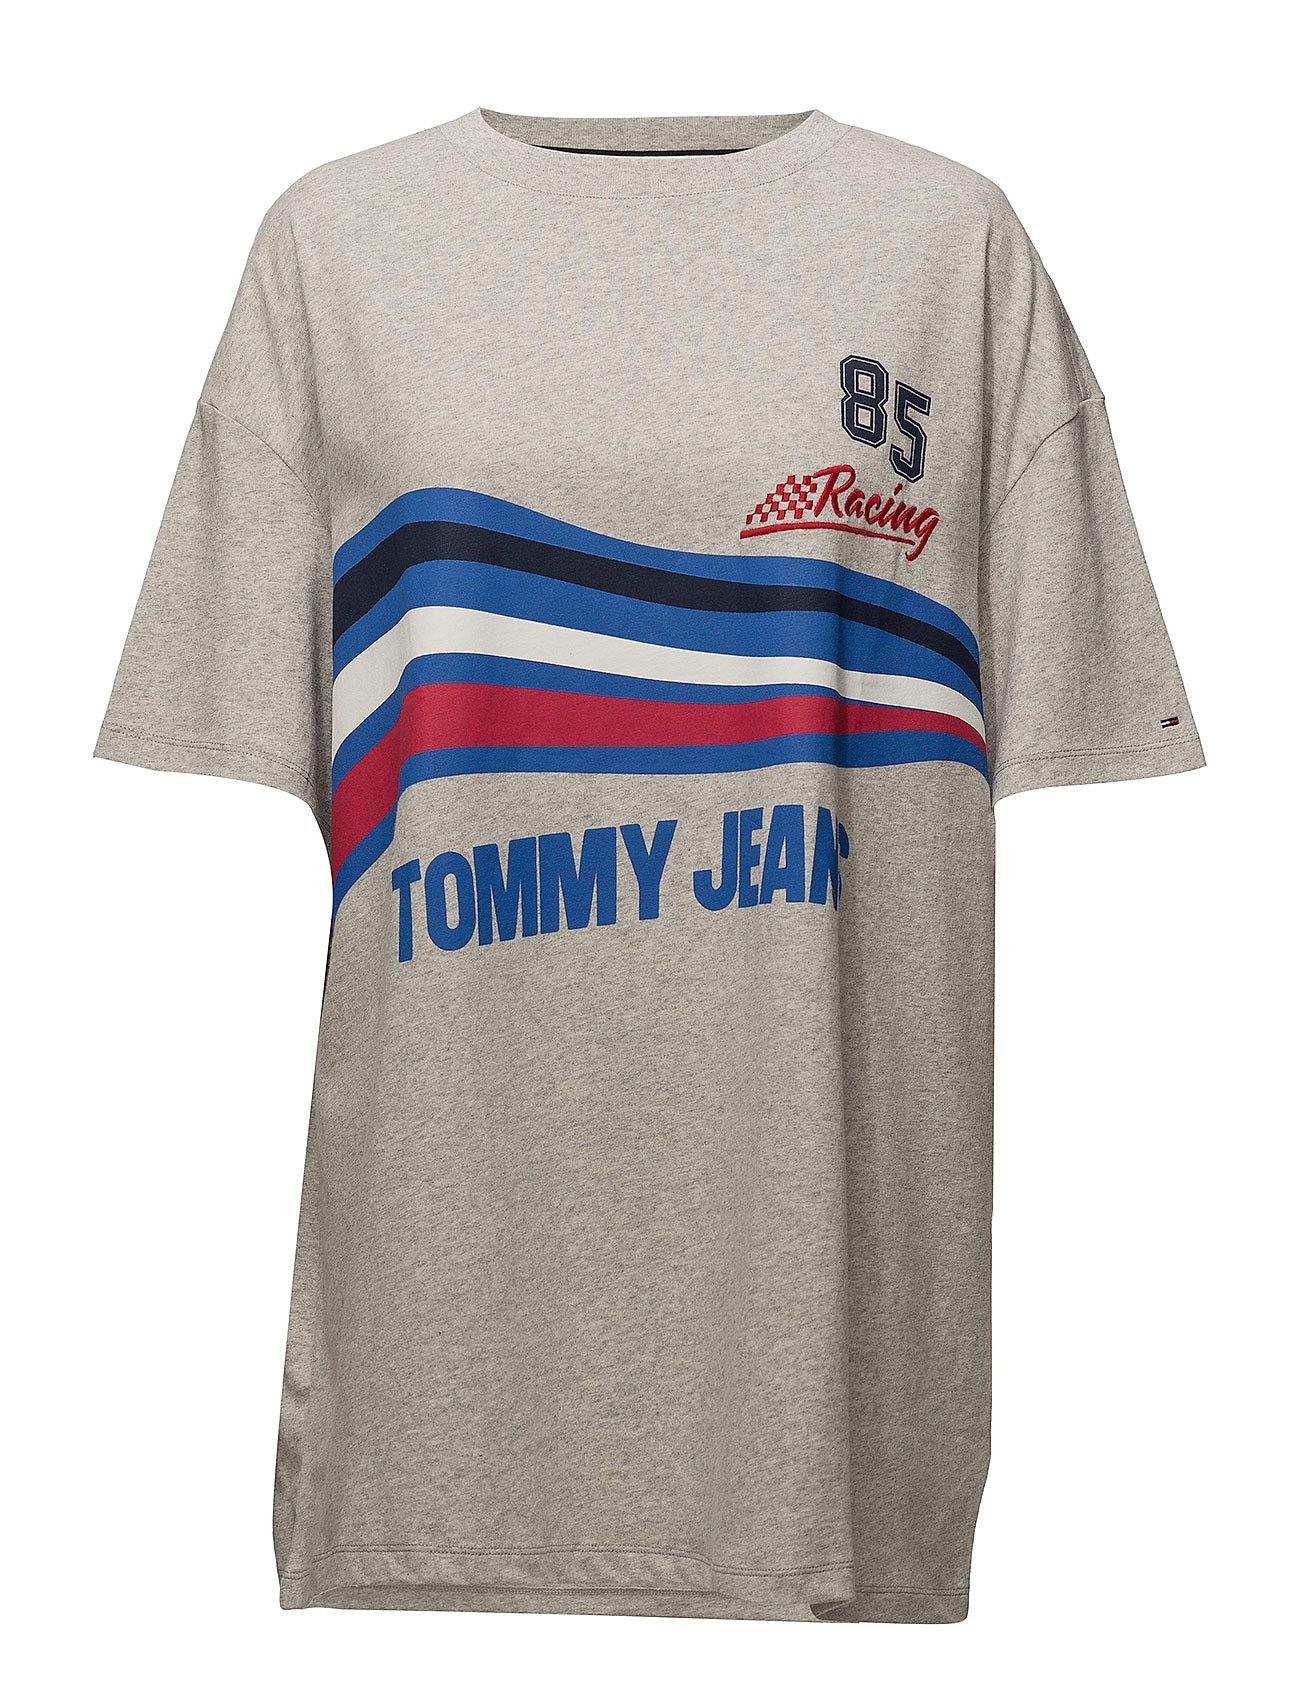 Tommy Jeans TJW LOGO PRINT TEE DRESS - LIGHT GREY HTR